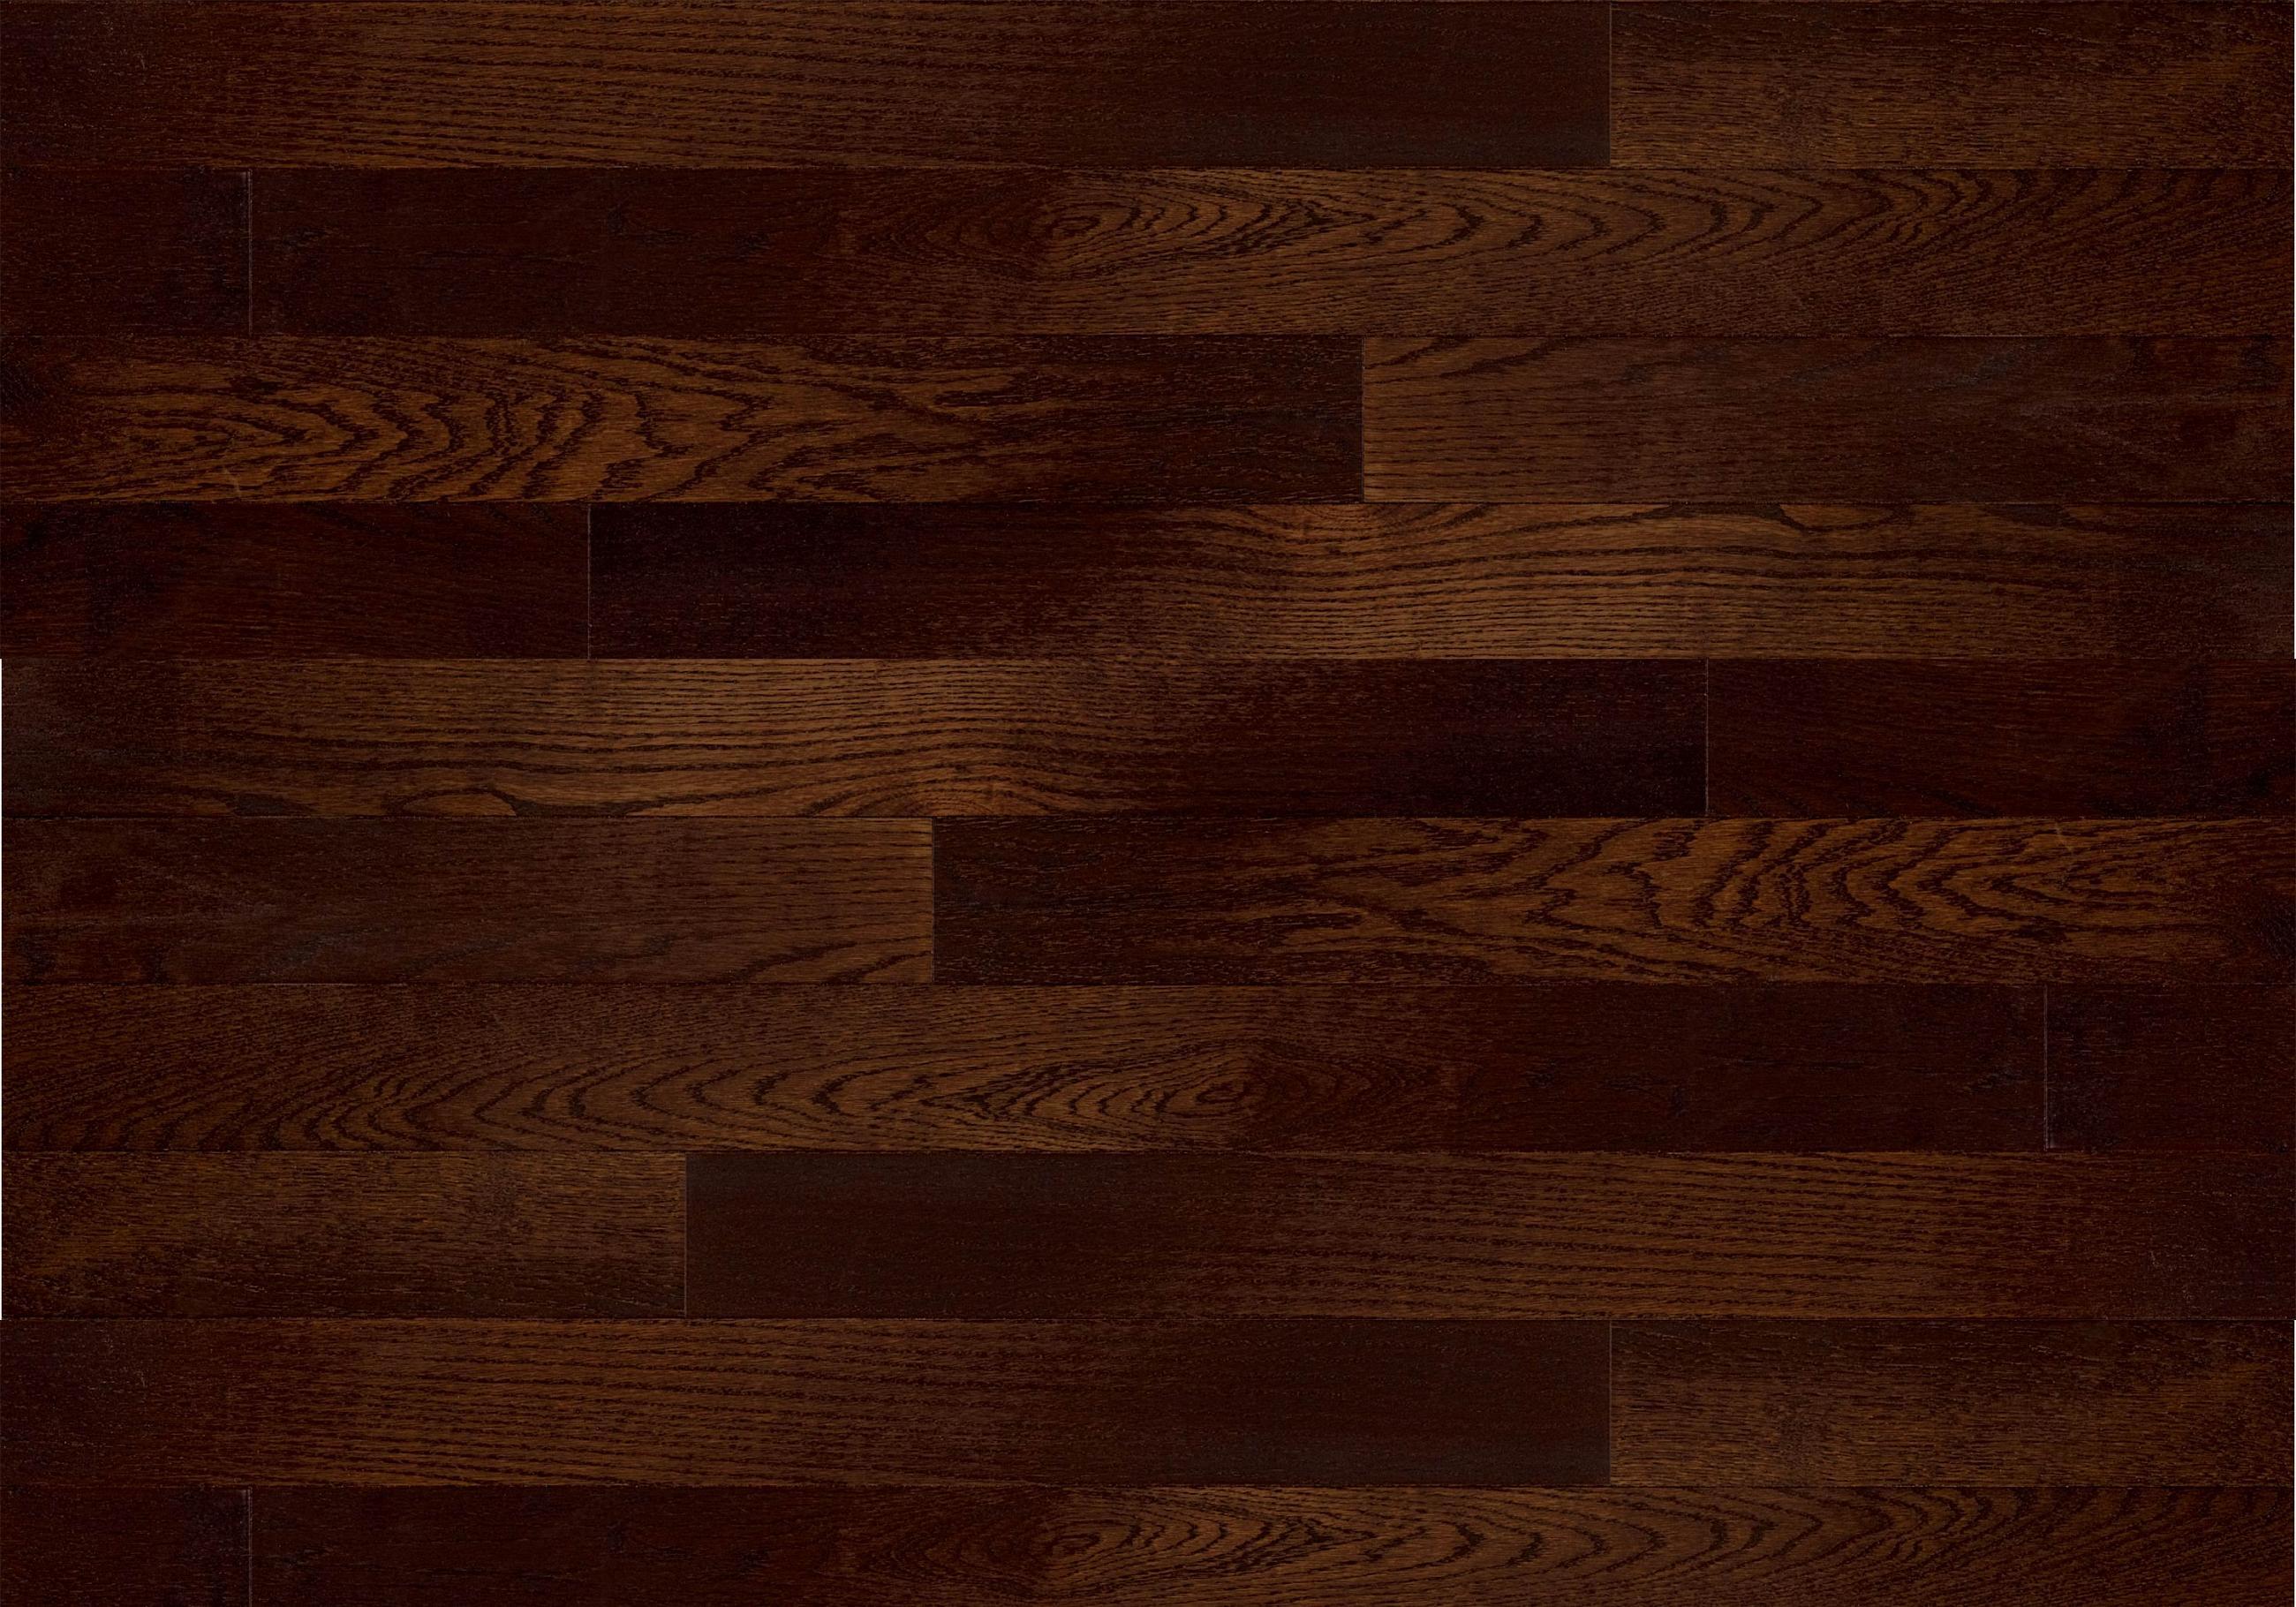 Lauzon antique red oak antique cherry aa floors toronto for Antique hardwood flooring